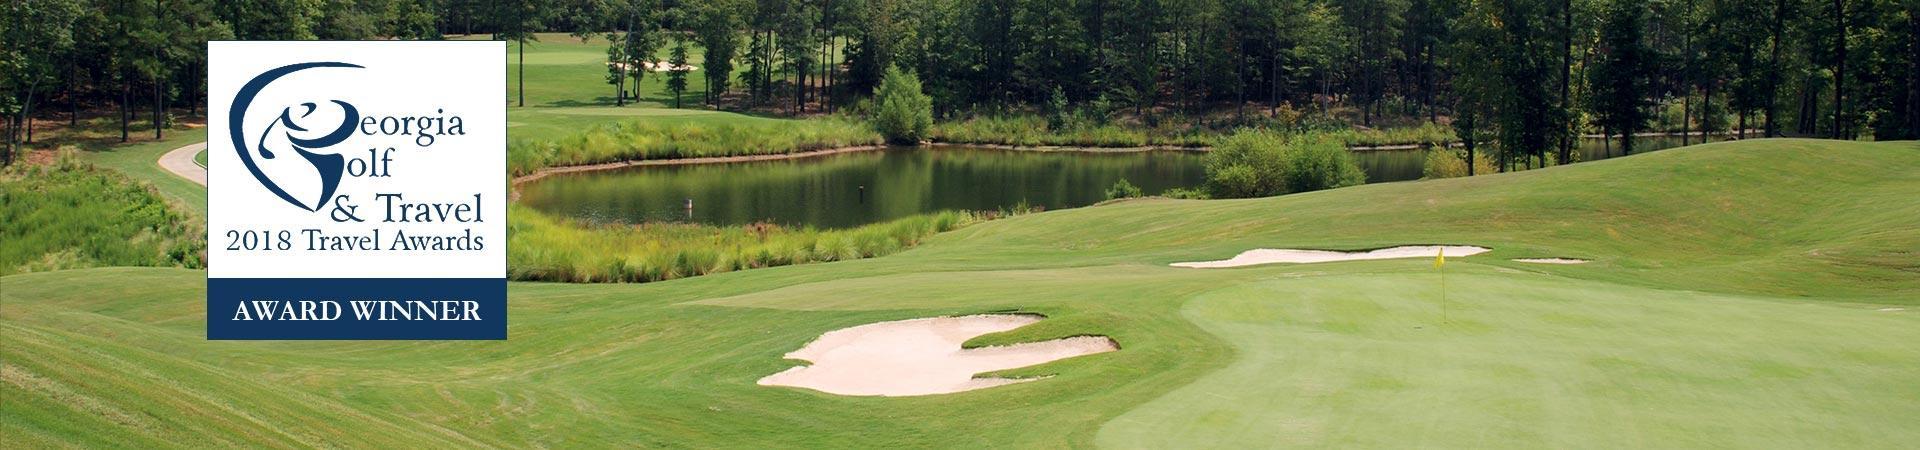 Arrowhead Pointe - Georgia Golf and Tourism Award Winner